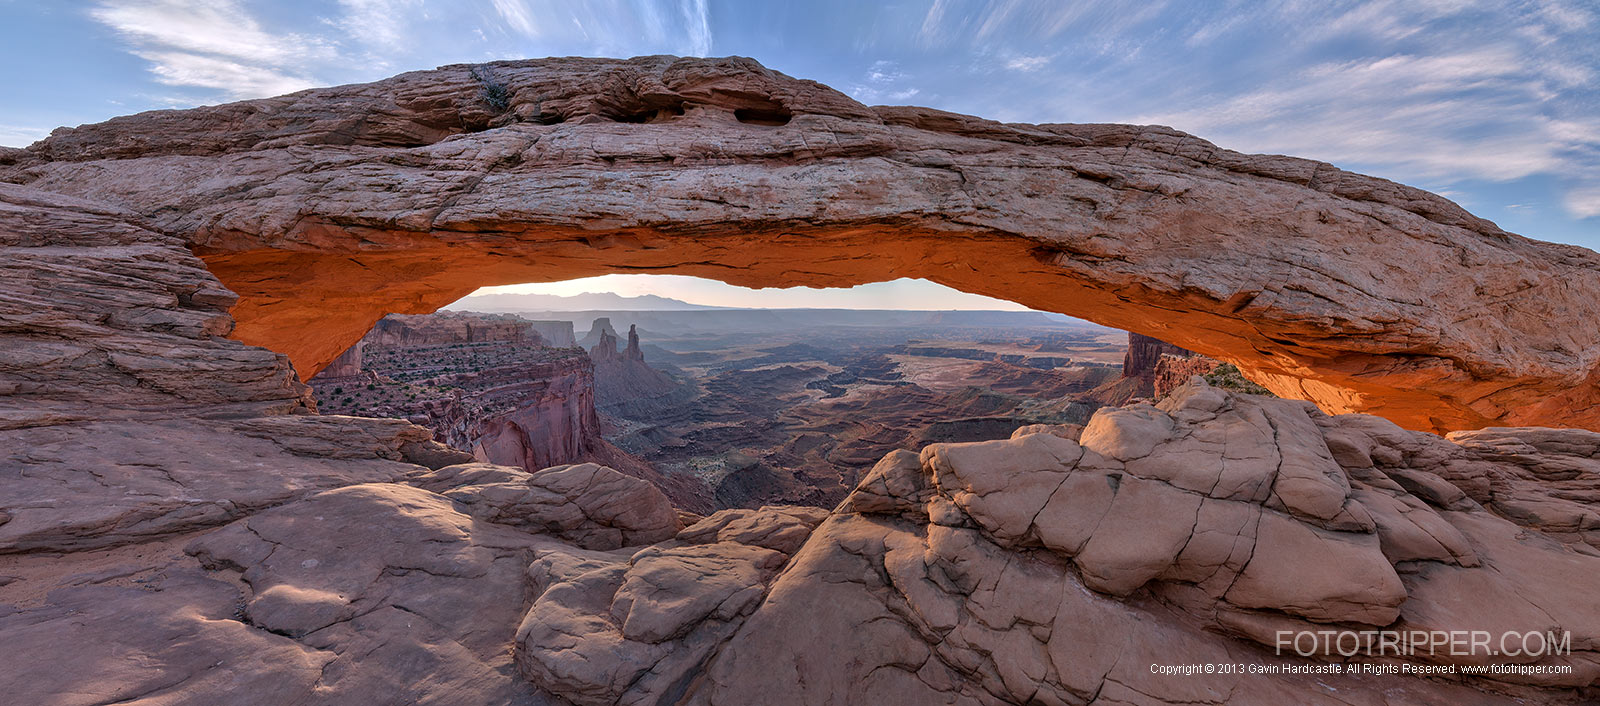 Mesa Arch Photo Guide, Panaroma